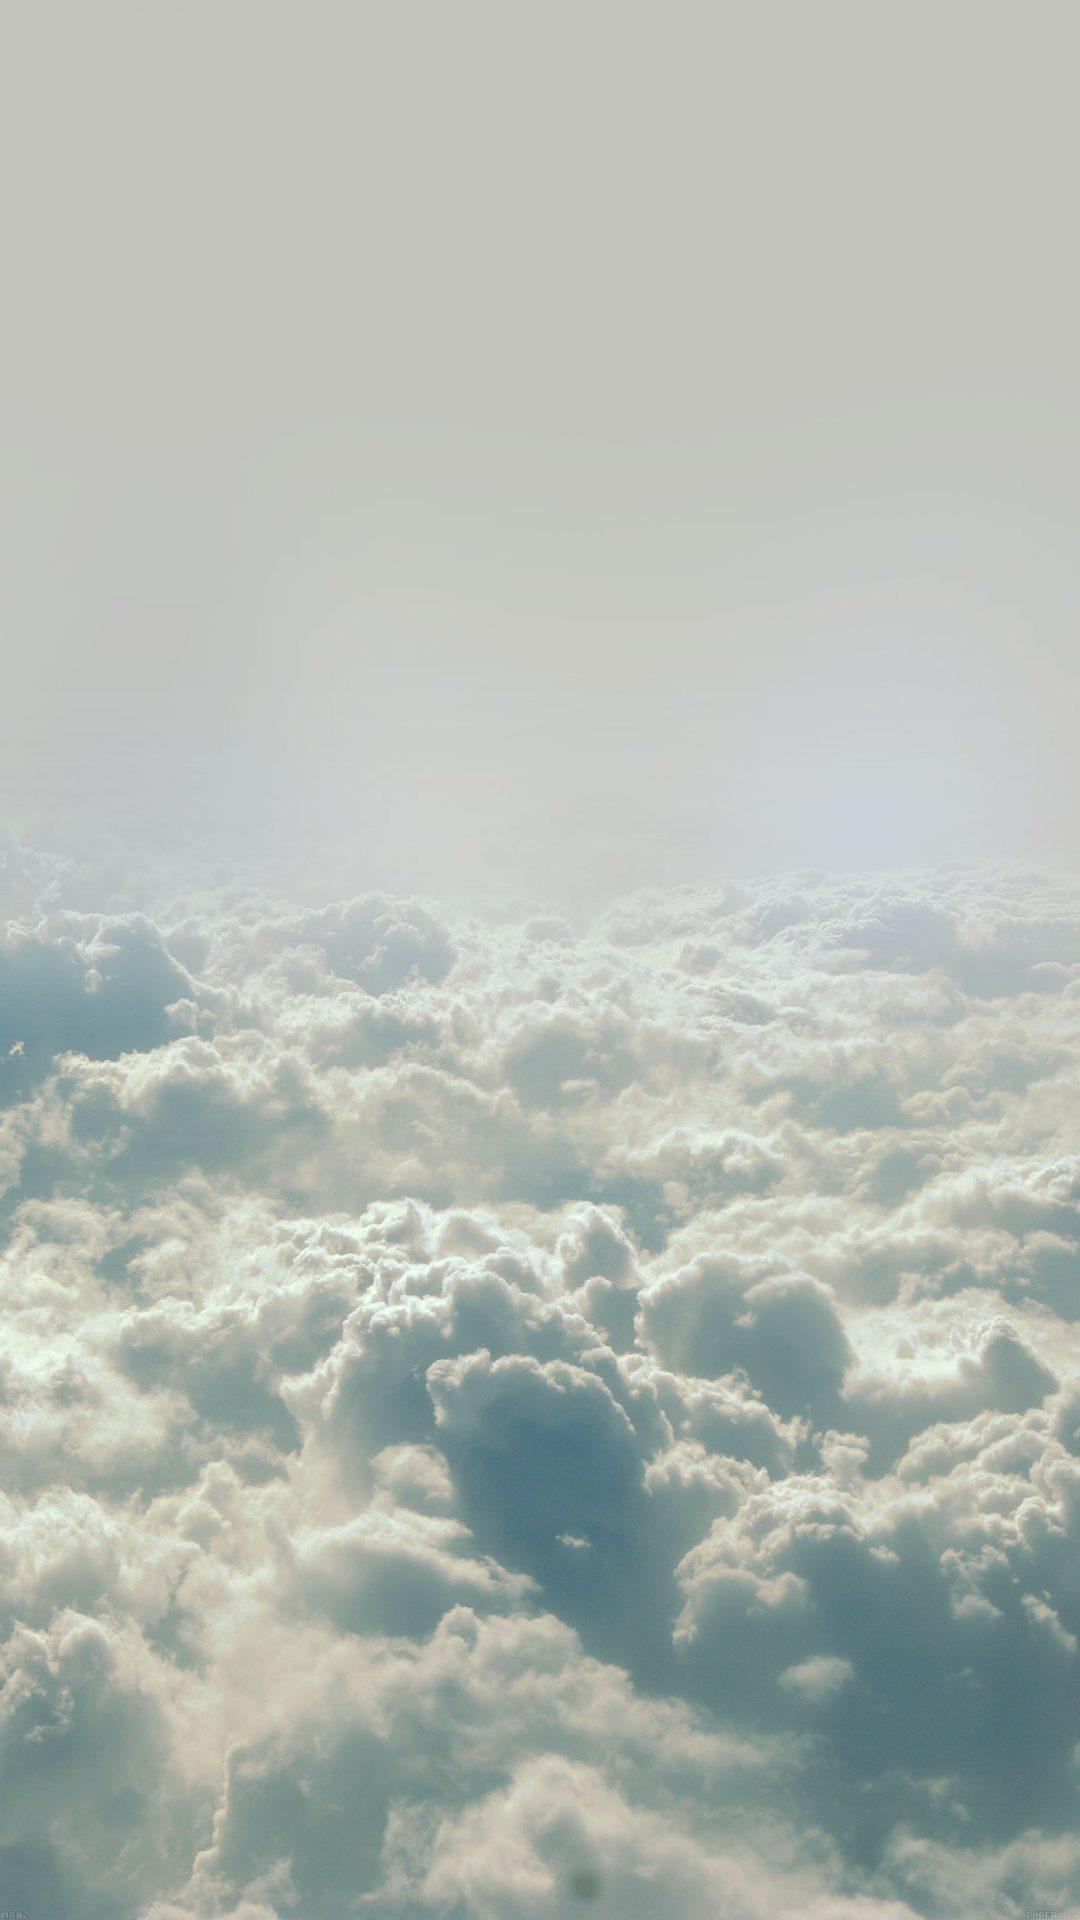 Cloud Flare Blue Sky Believe Fly Nature